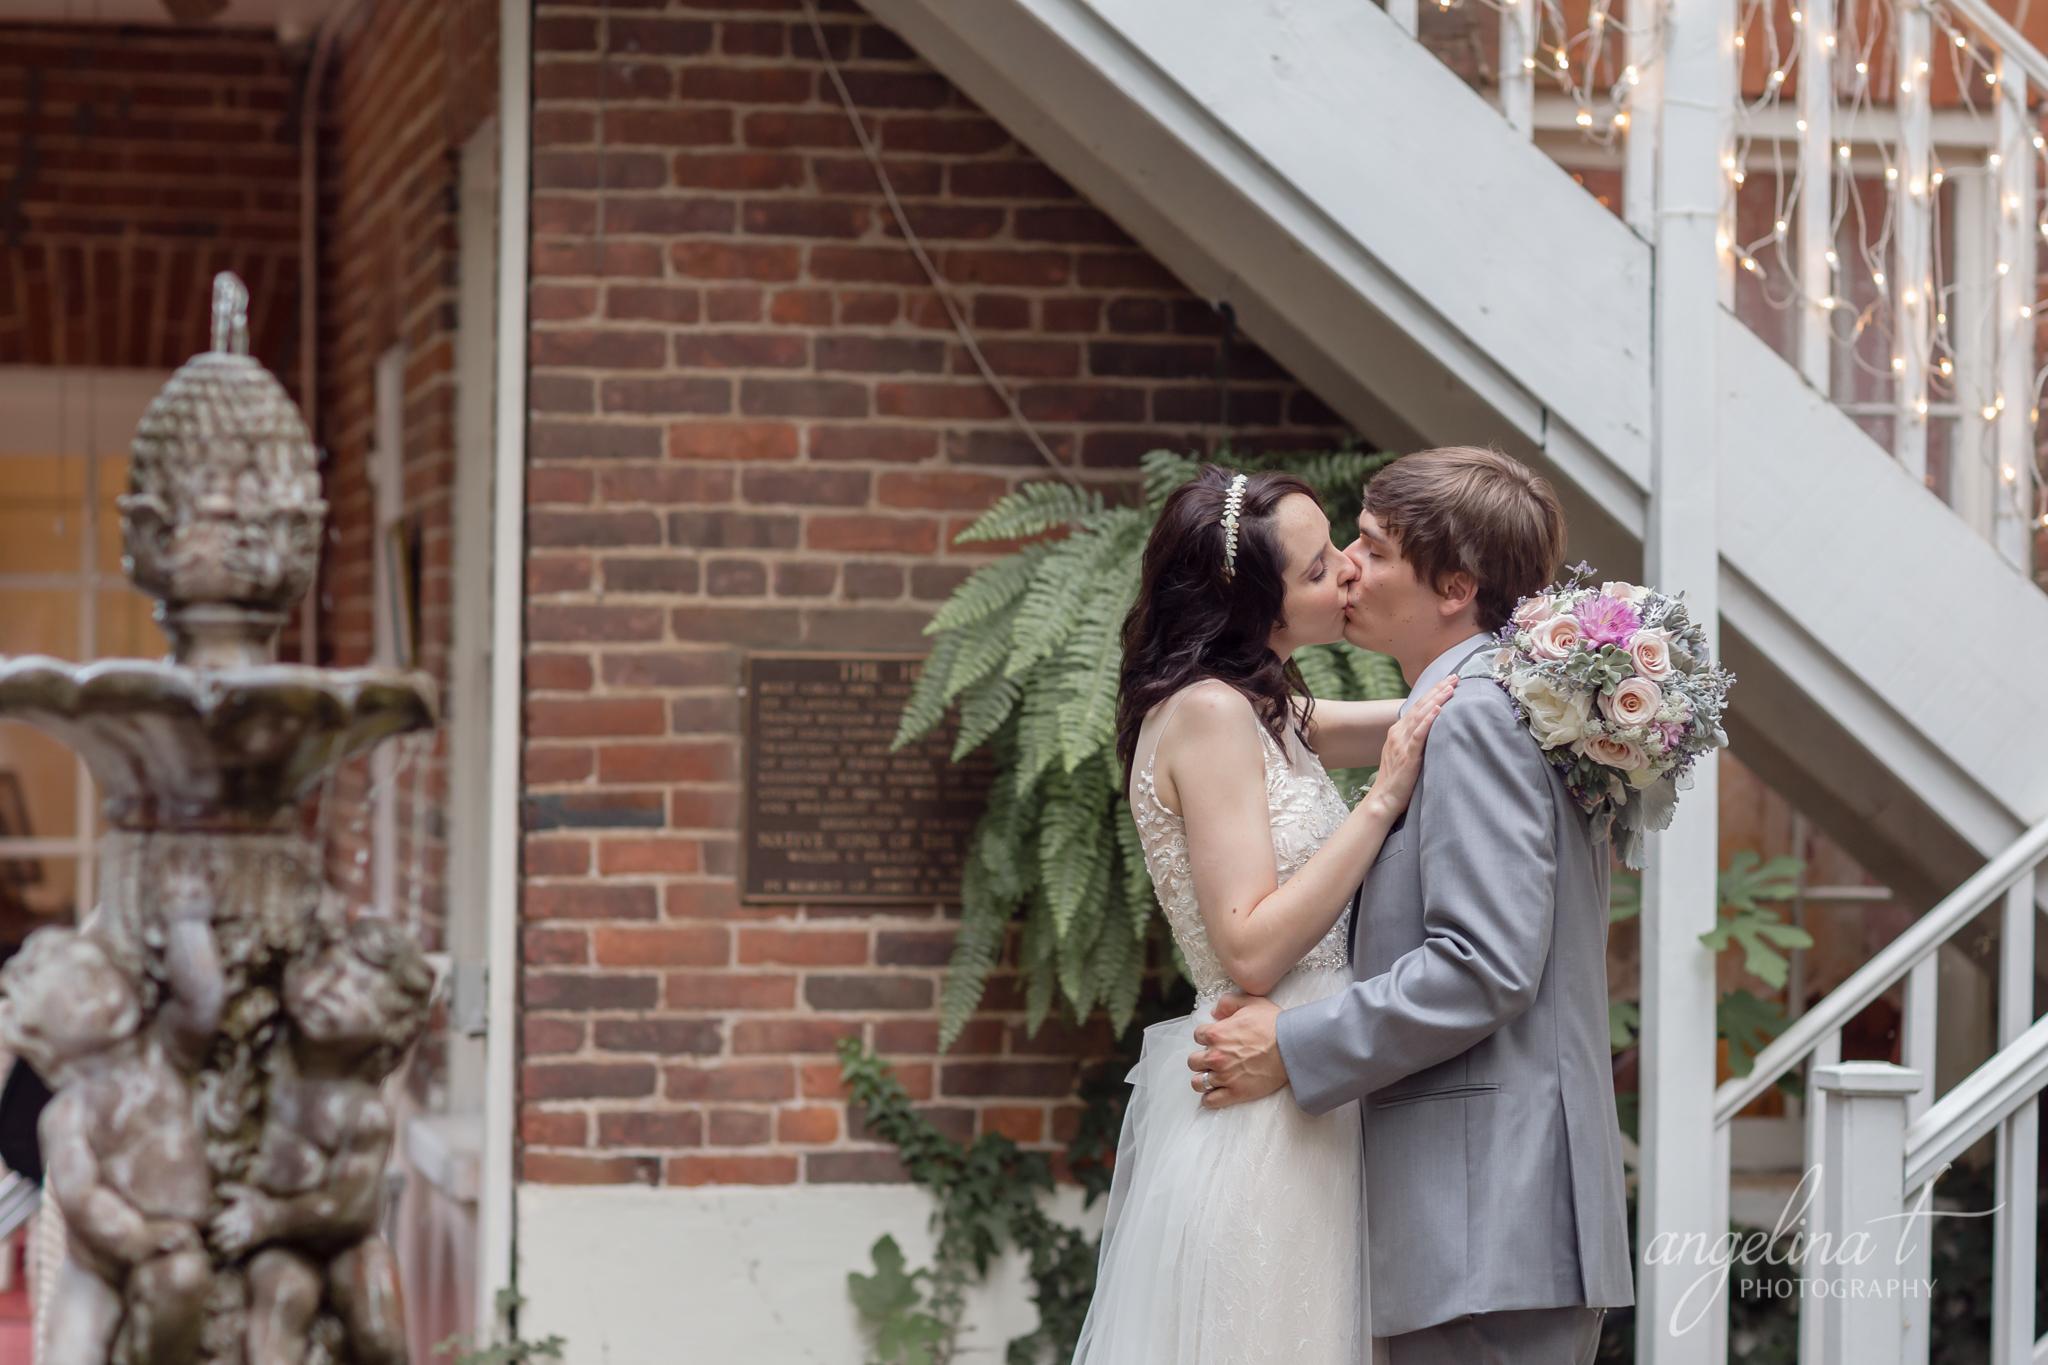 Heirloom-Inn-Garden-Wedding-Photography-Ione-68.JPG